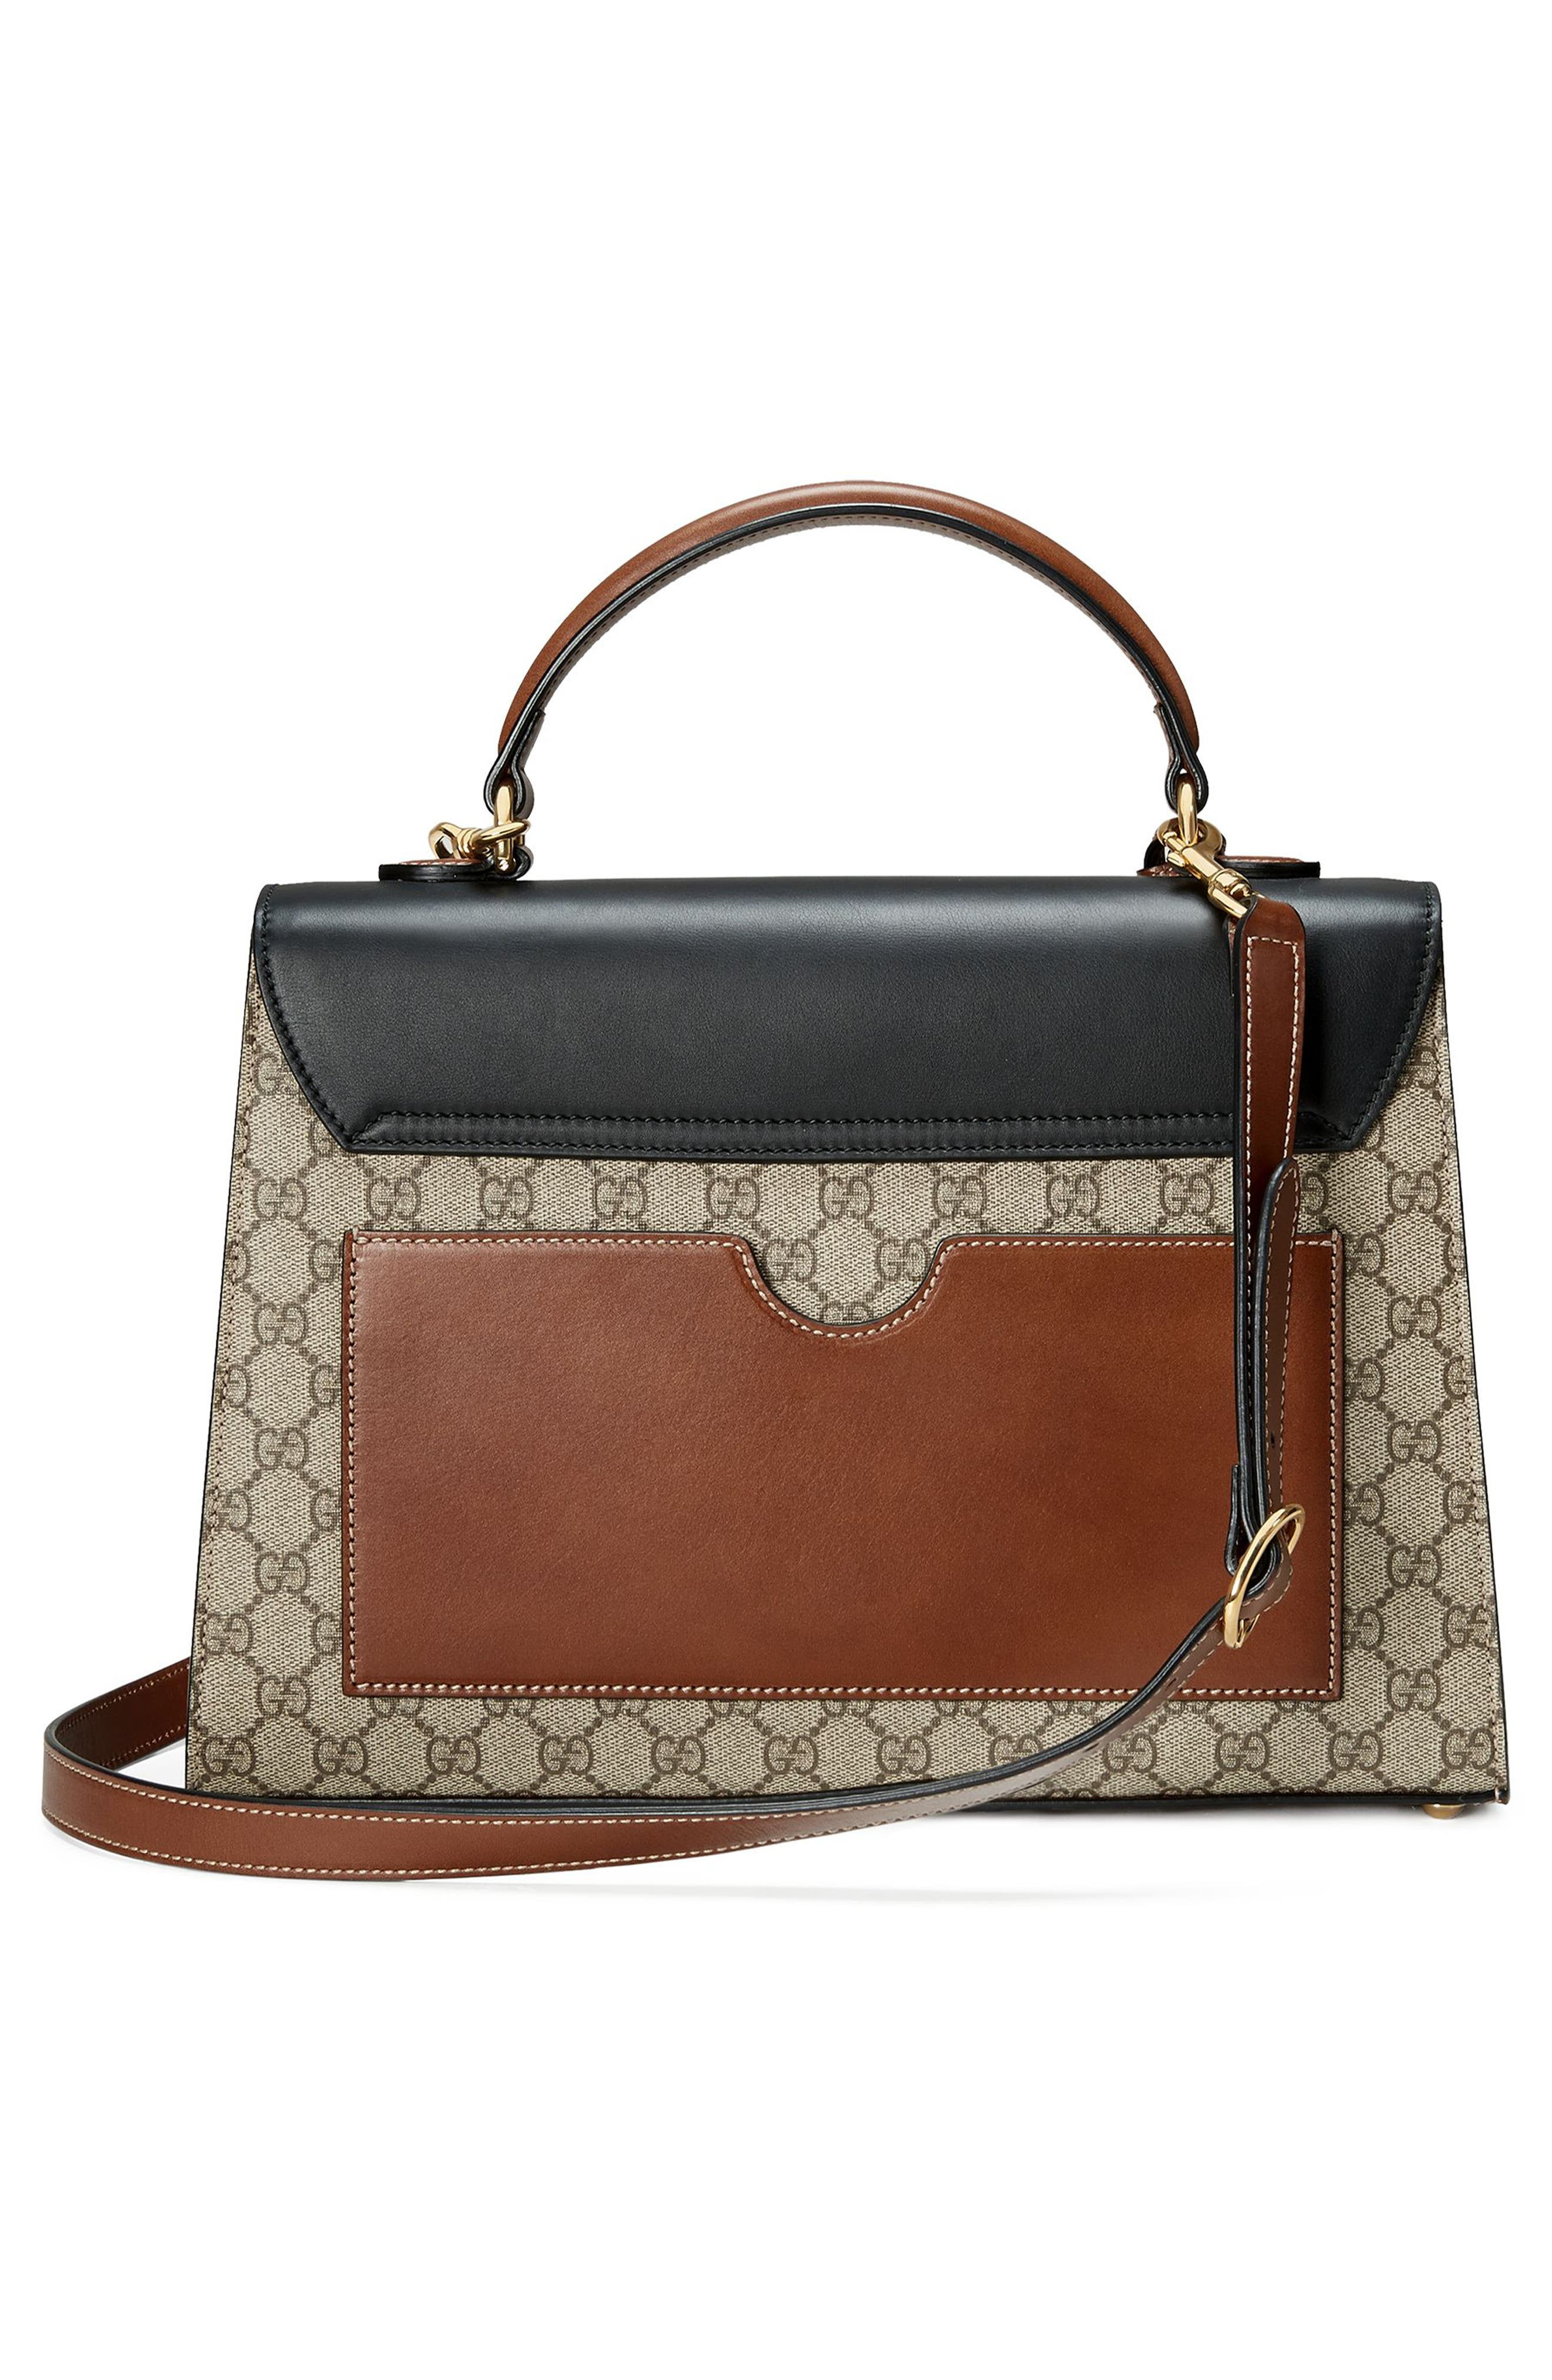 Medium Padlock Top Handle GG Supreme Canvas & Leather Bag,                             Alternate thumbnail 2, color,                             964